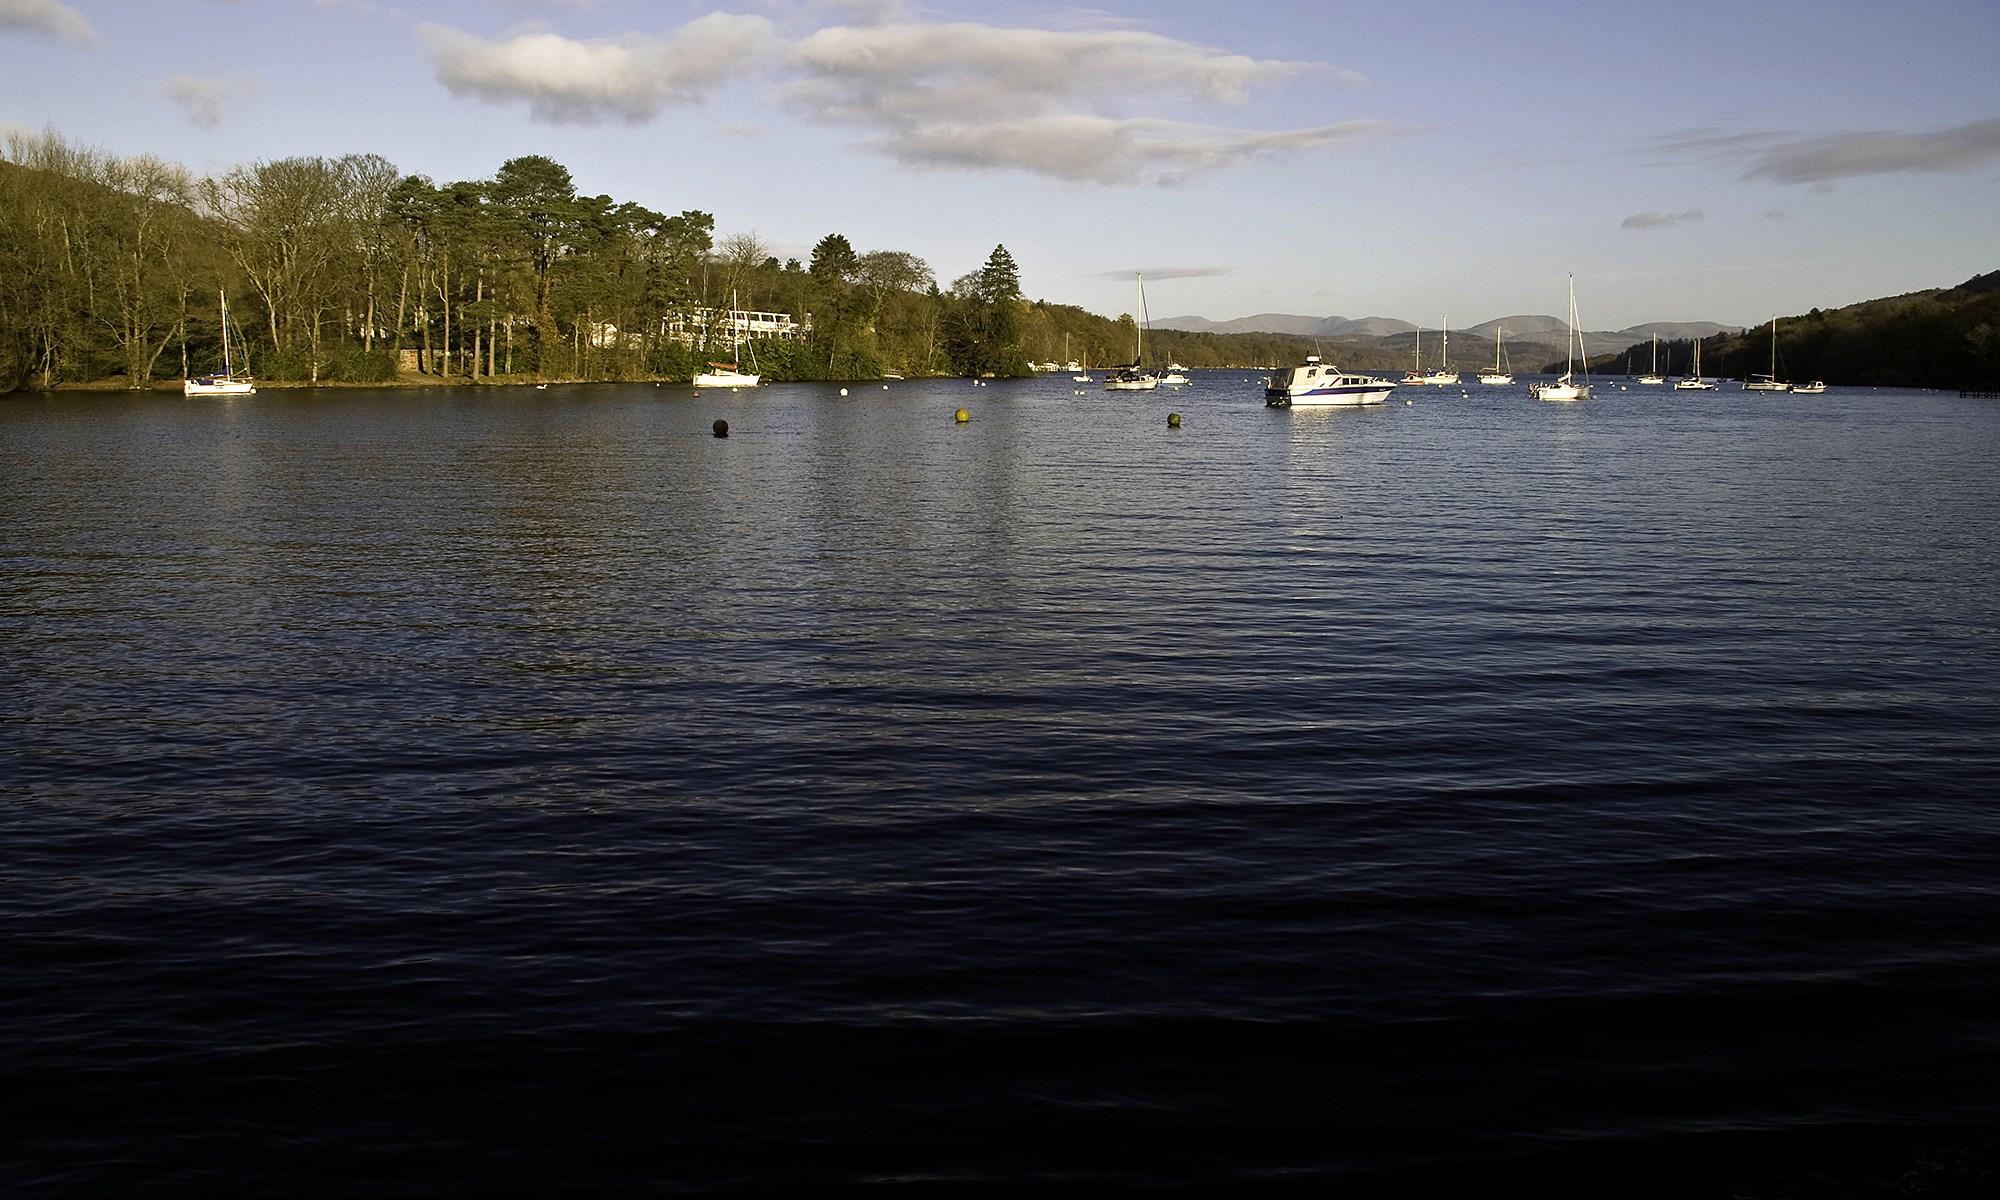 Windermere, Lake District National Park